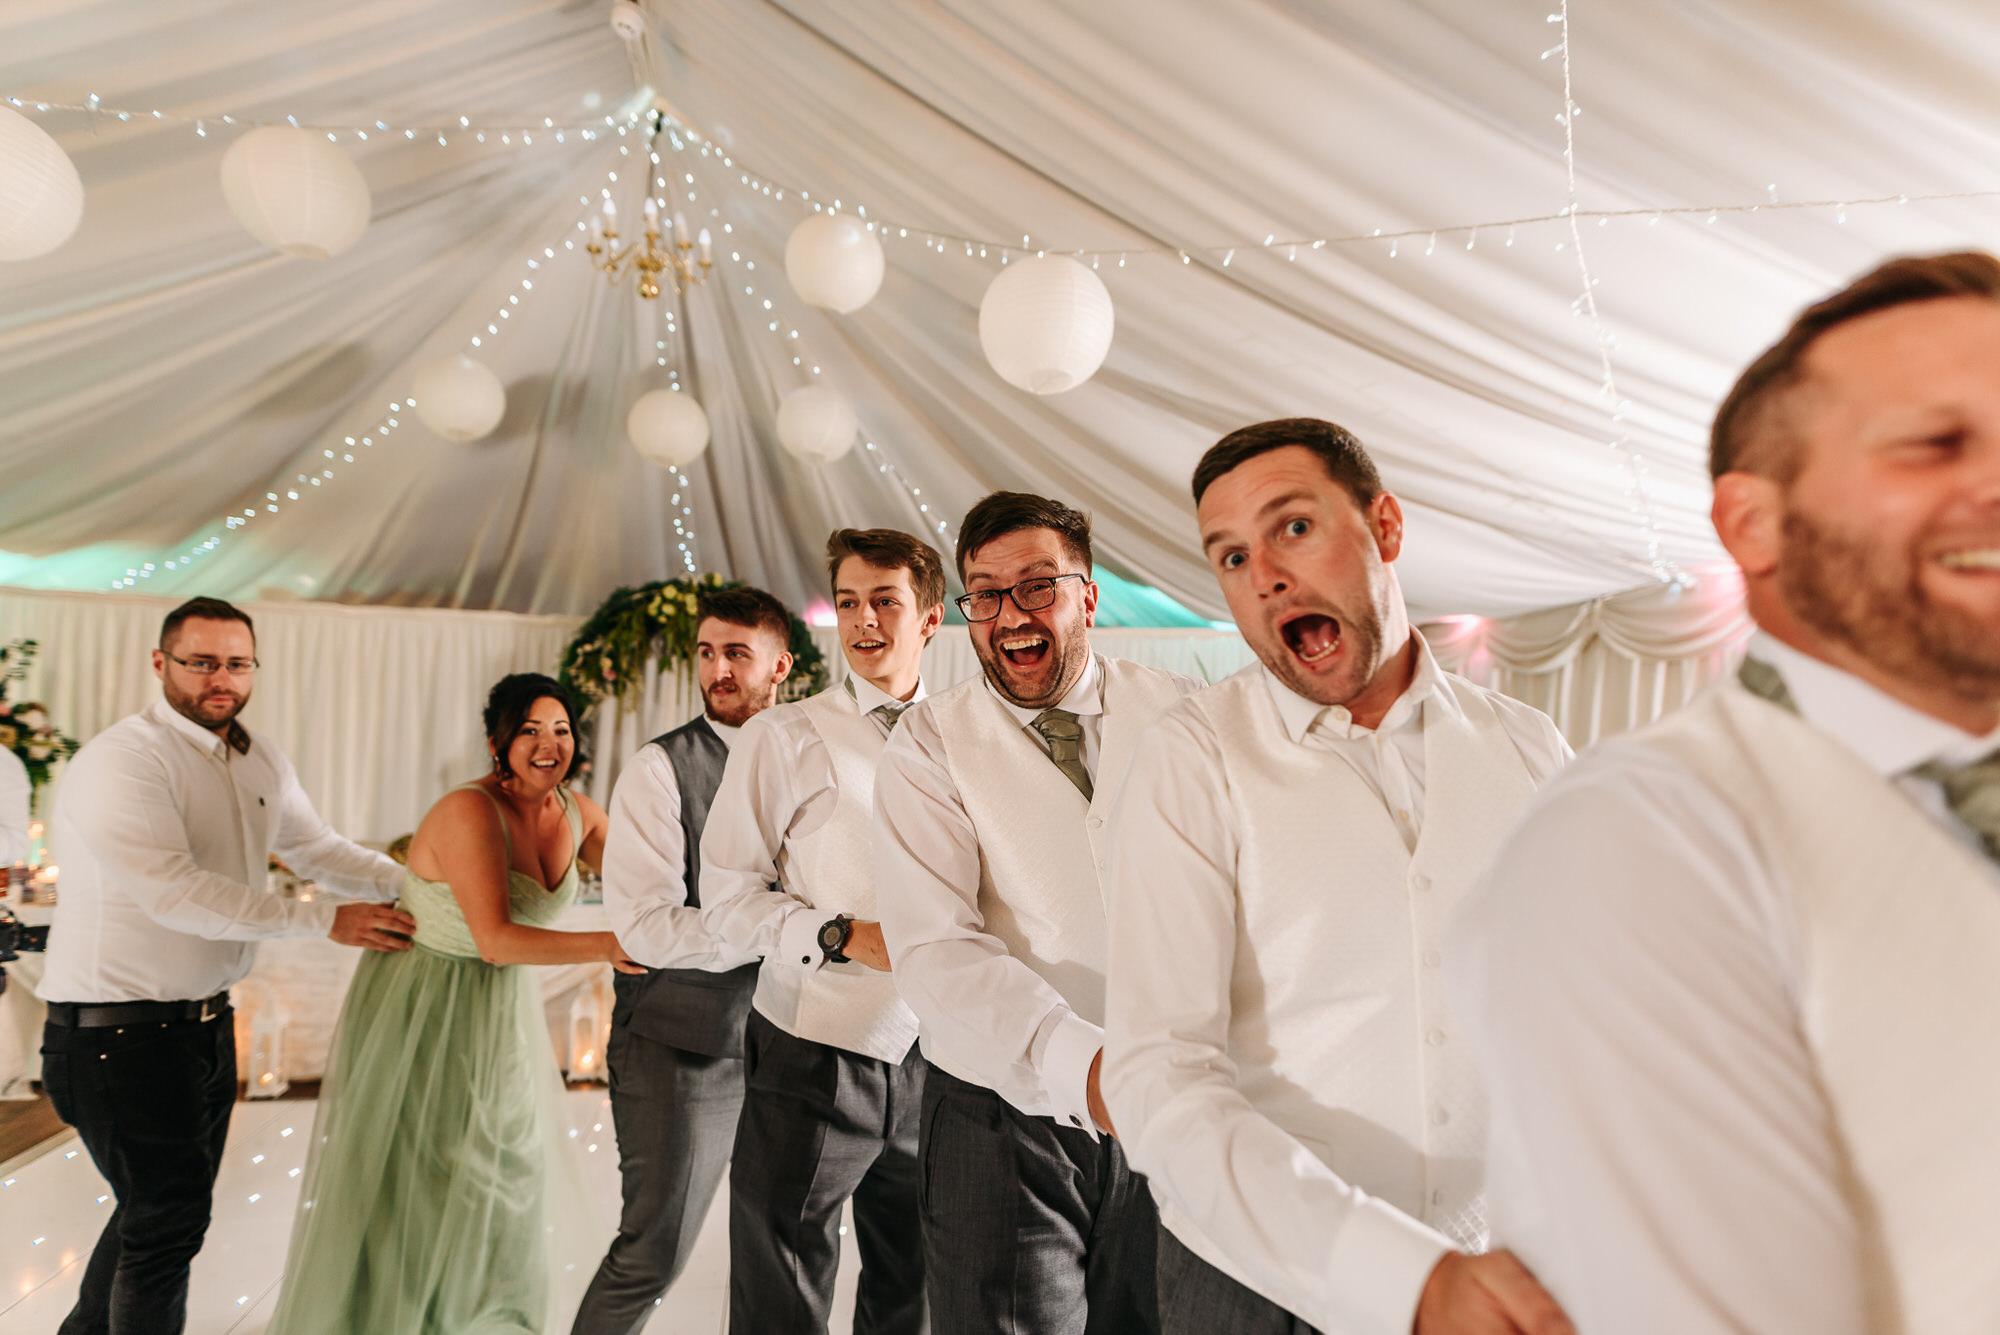 Best Of Yorkshire Wedding Photography 2017 - Martyn Hand-68.jpg